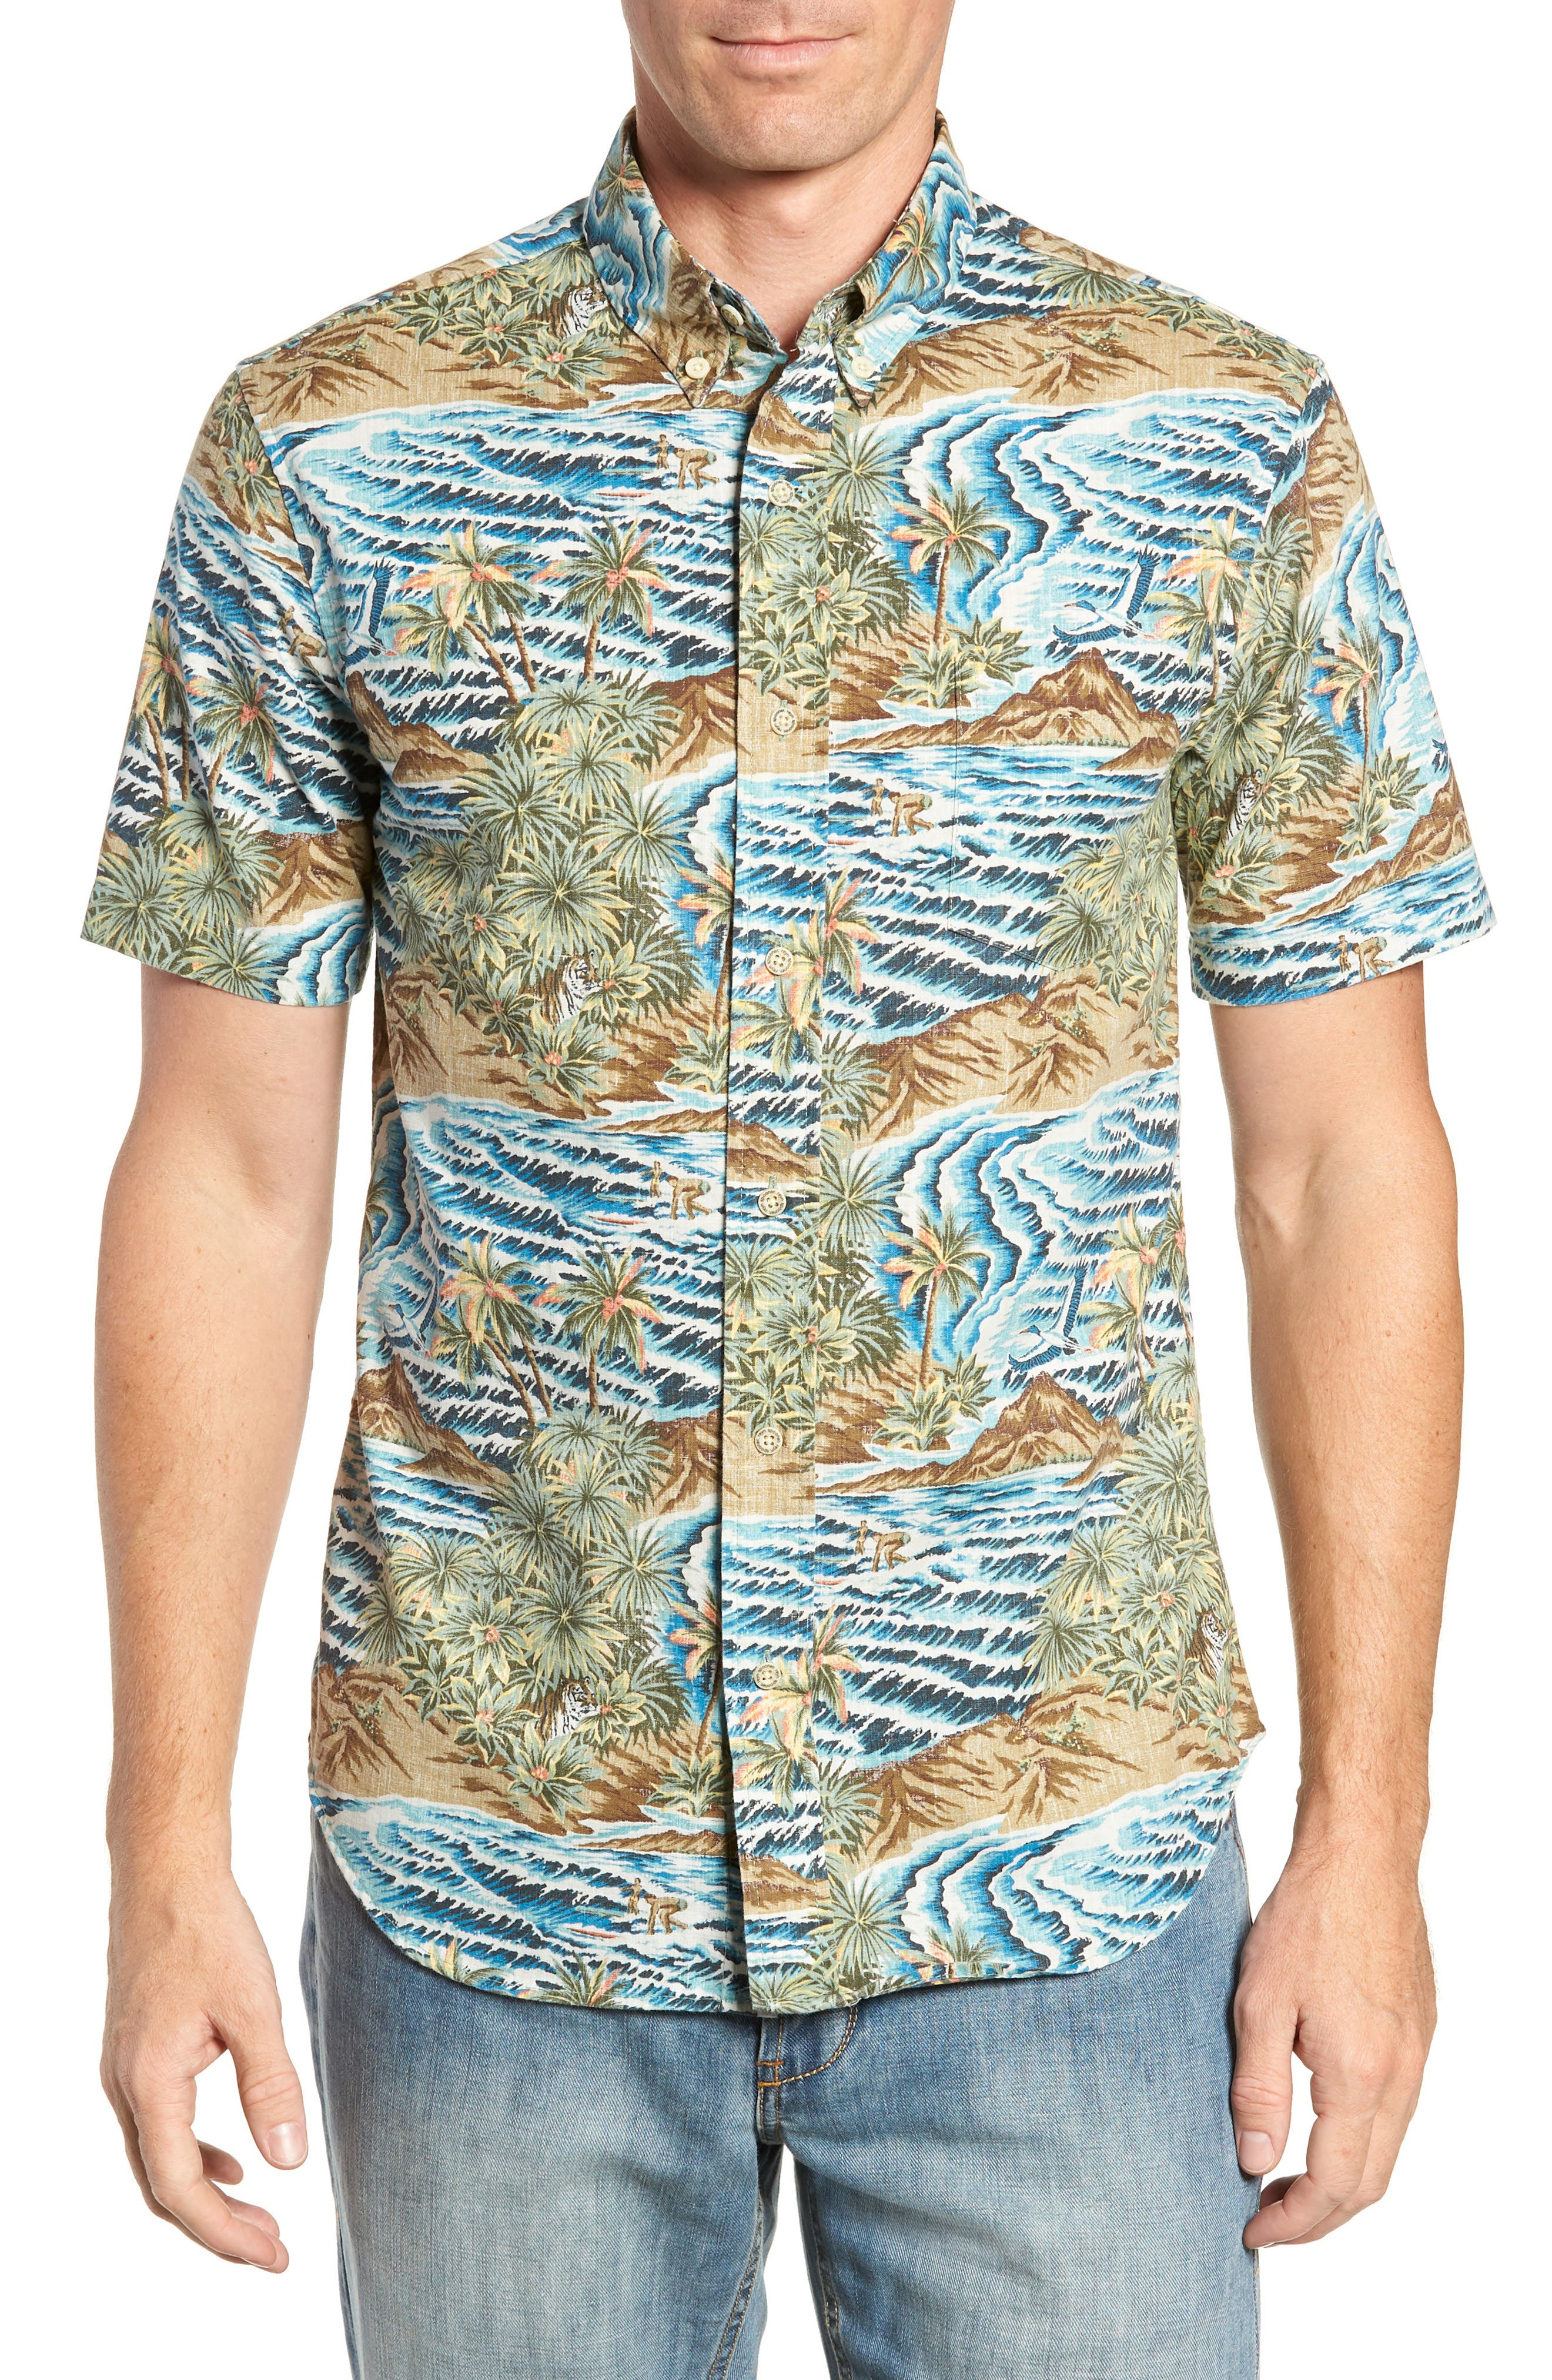 Sumatra Slide Tailored Fit Sport Shirt,                             Main thumbnail 1, color,                             430